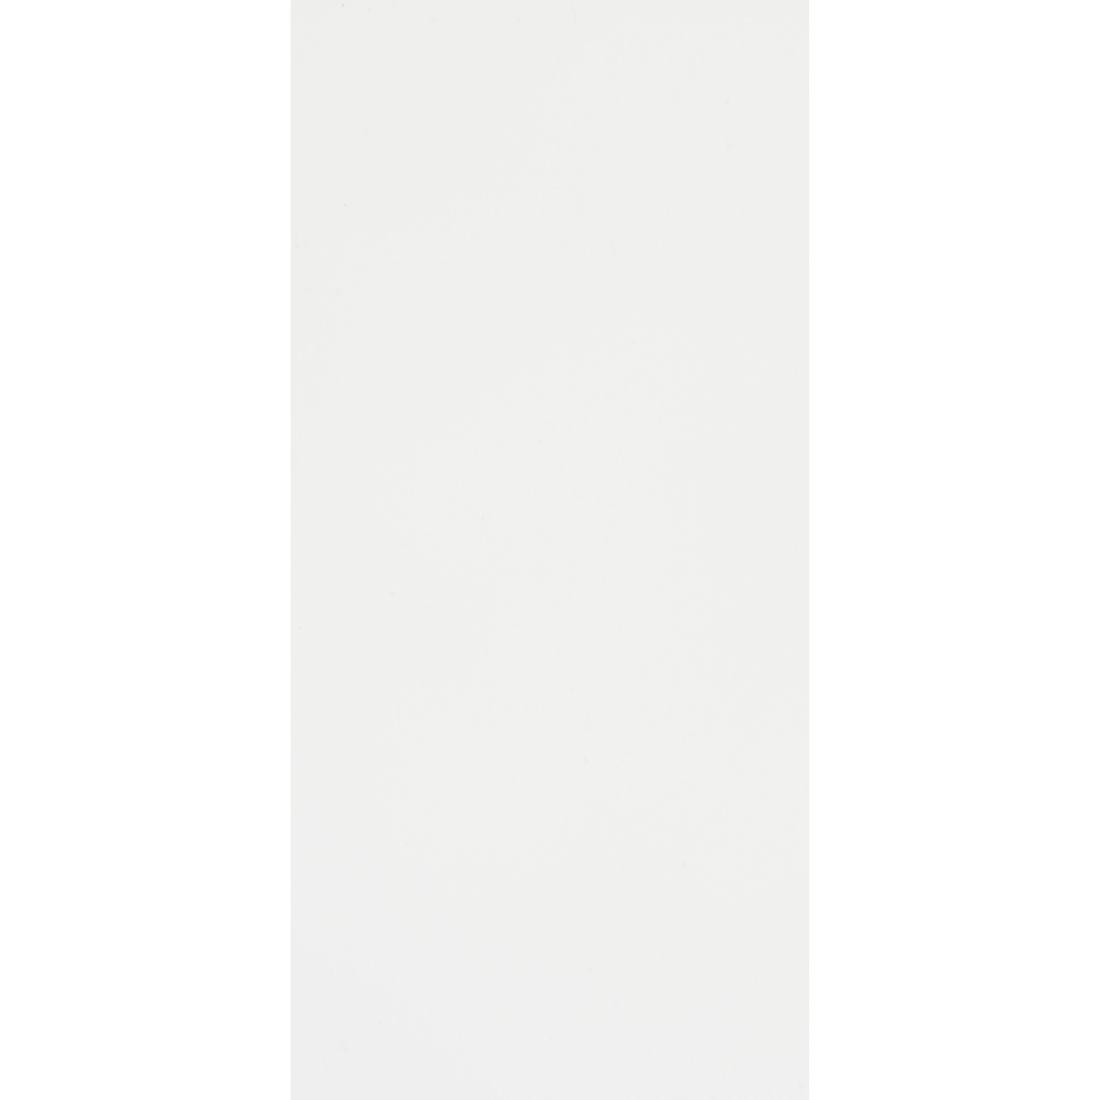 Classic Wall Lining Panel Polar Gloss 2400 x 900 x 4.5mm